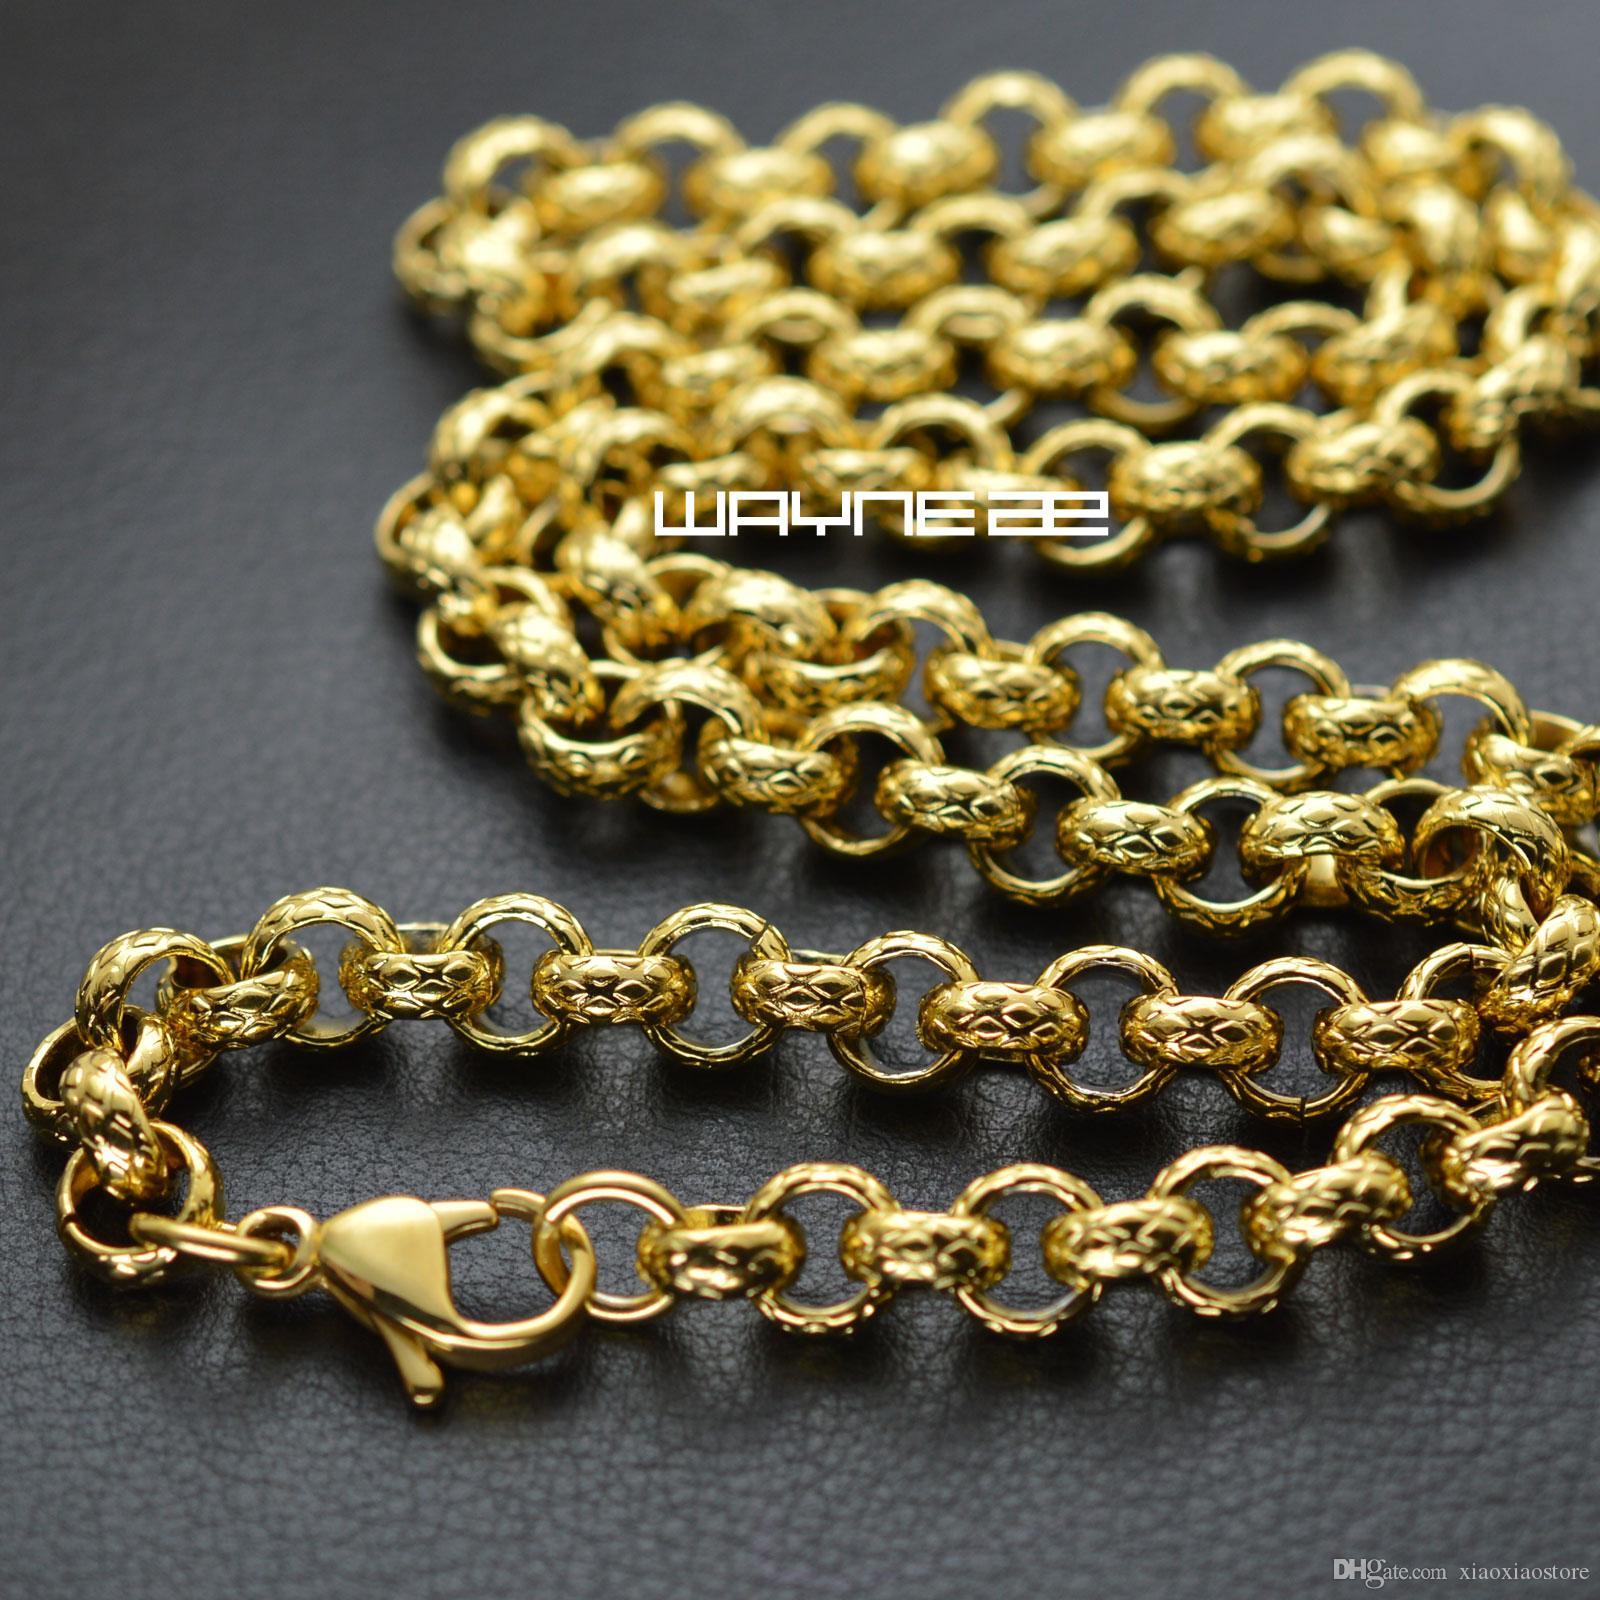 n308-Gold tone 50cm,60cm,70cm Length Men Women Solid ring link Necklace Chain